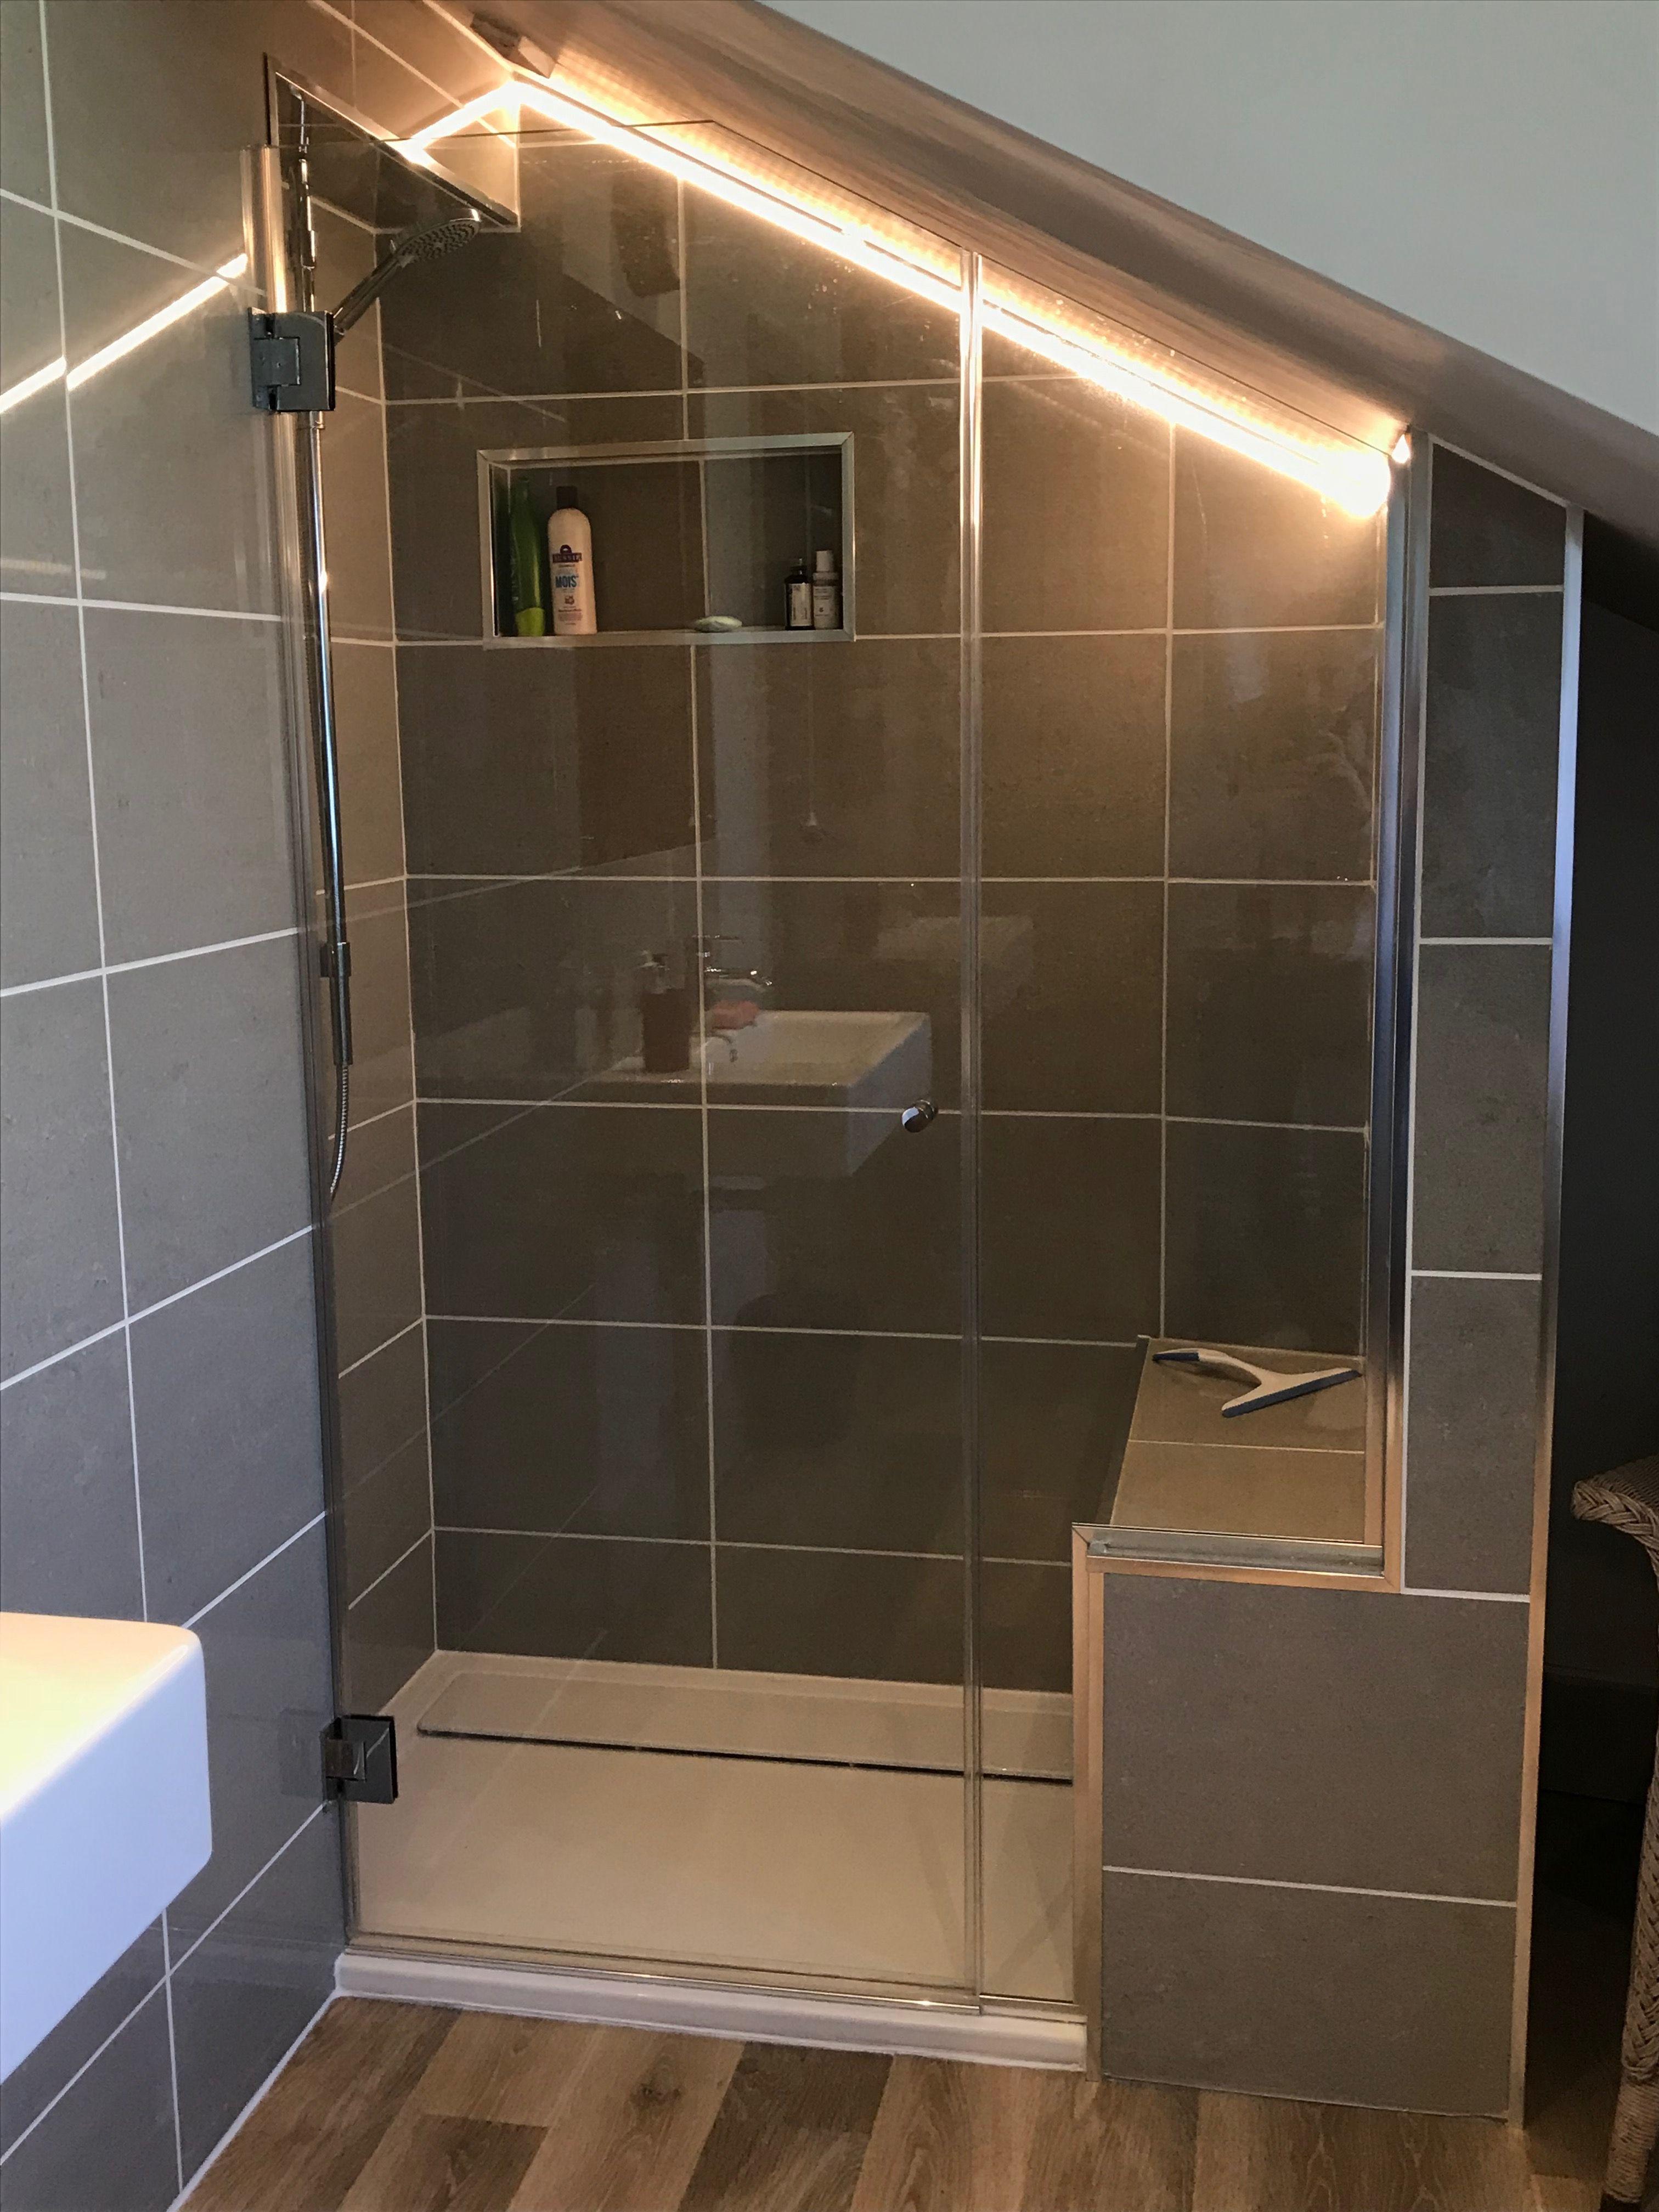 Frameless Loft Shower Enclosure Small Bathroom Makeover Small Attic Bathroom Loft Bathroom